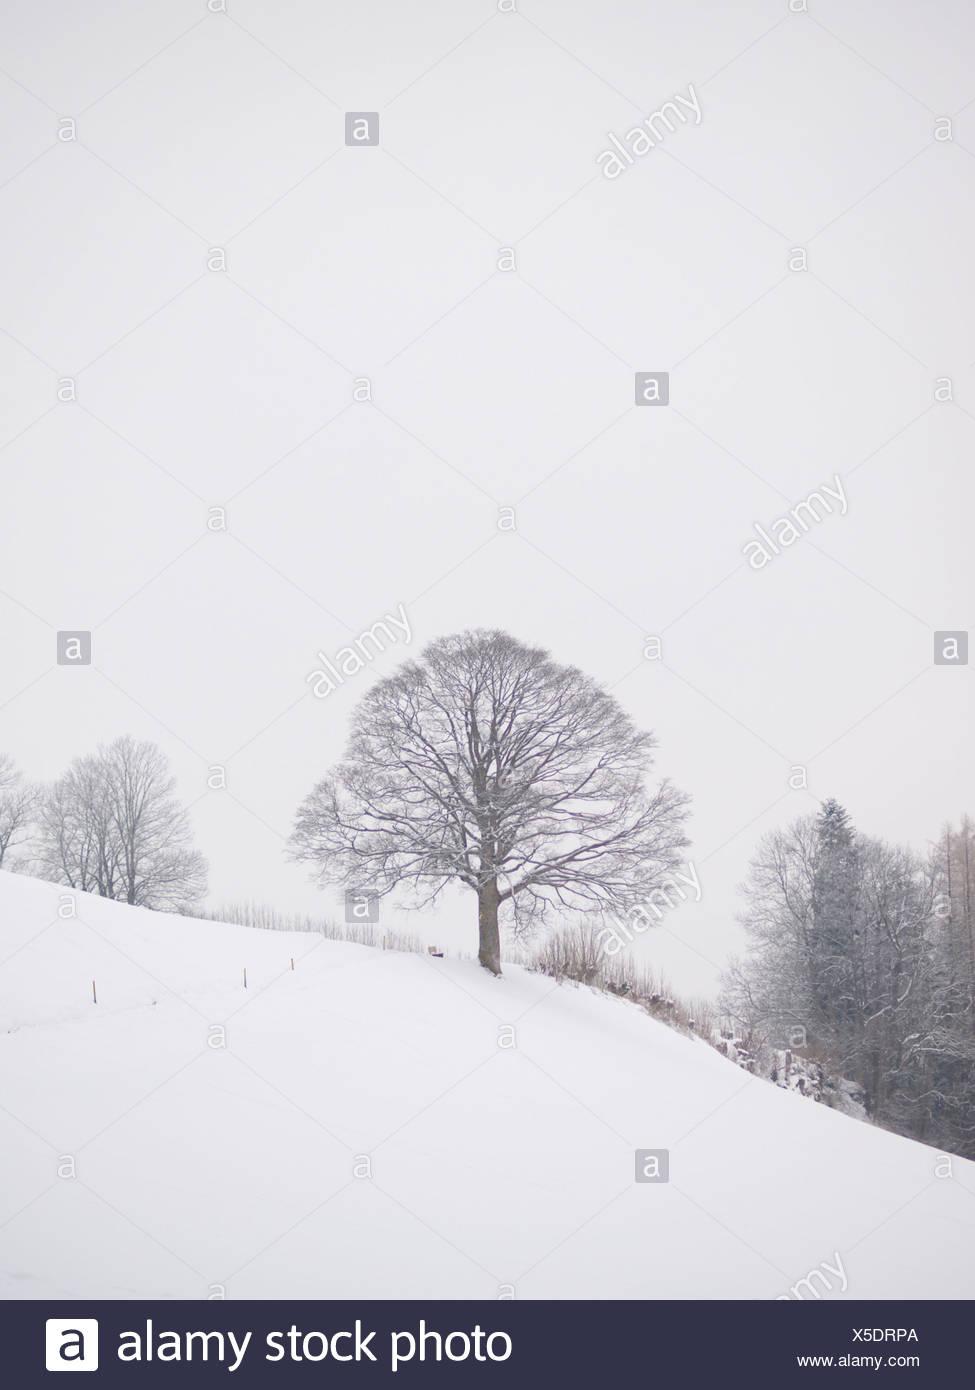 Appenzell, Ausserrhoden, Baum, Bäume, Strauch, Busch, Sträucher, Büsche, Nebel, hochrangige Nebel, Rehetobel, Schnee, Schweiz, Winter, Stockbild